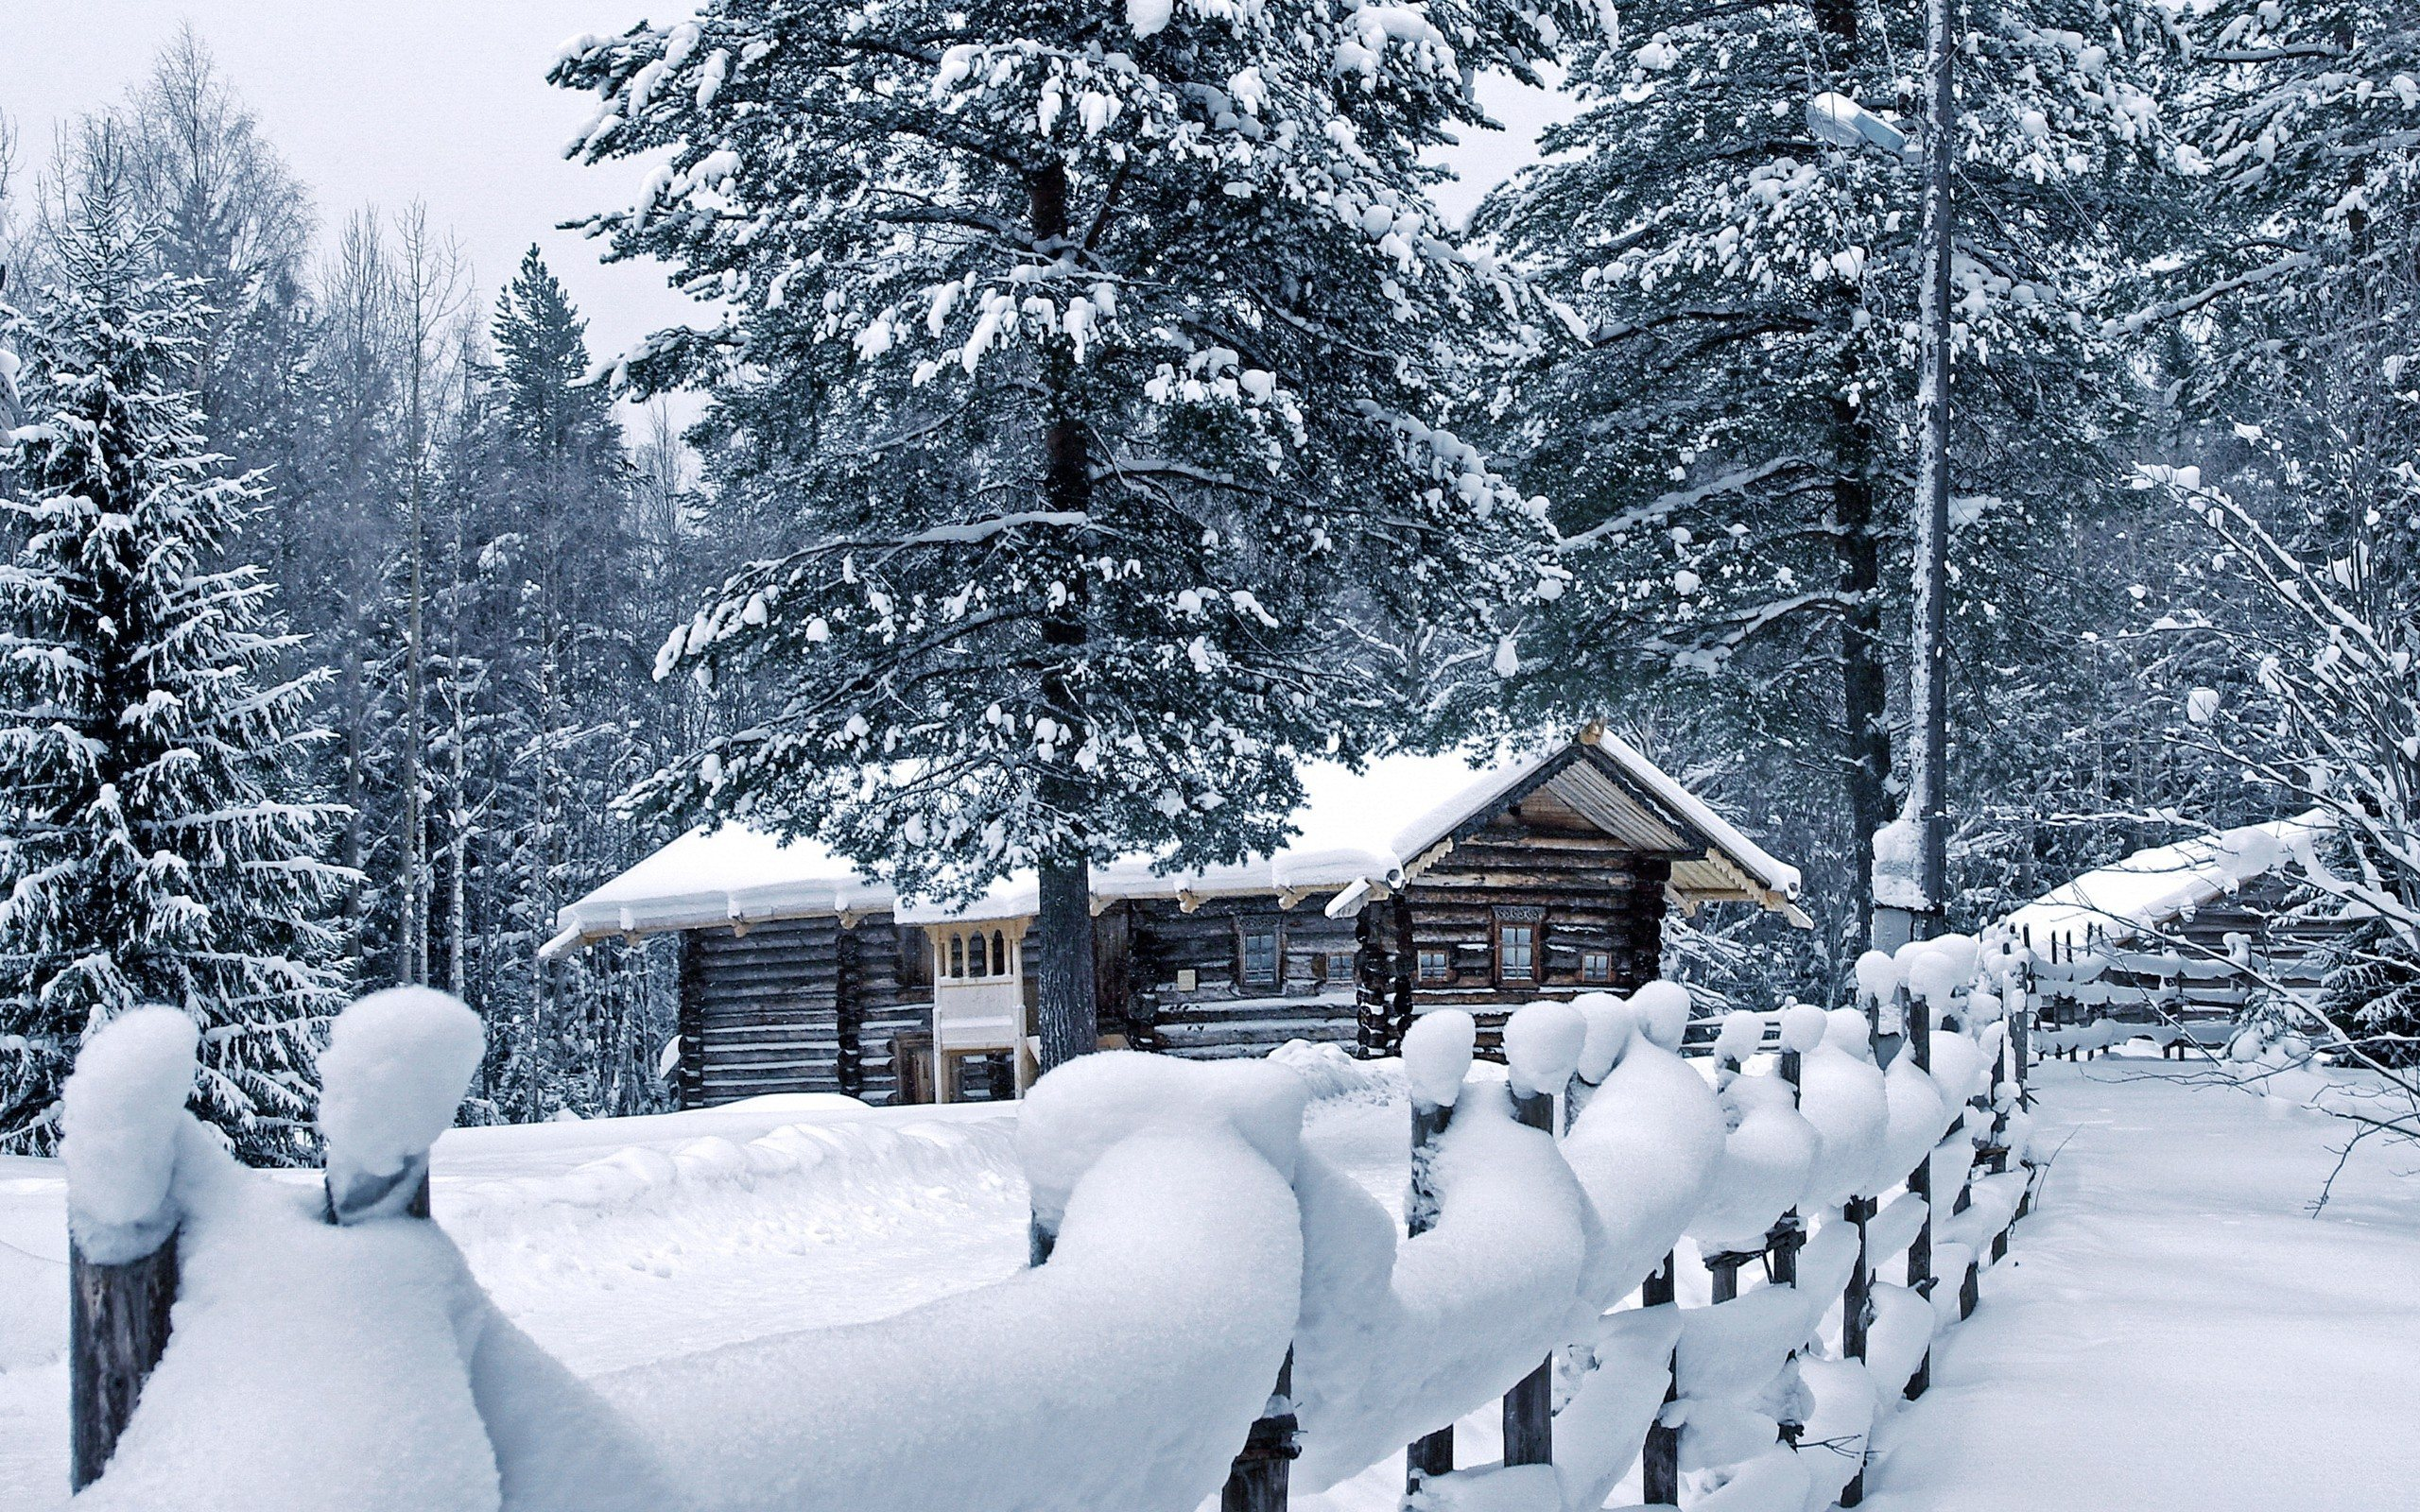 OBRÁZEK : zima__winter_2560x1600_012.jpg